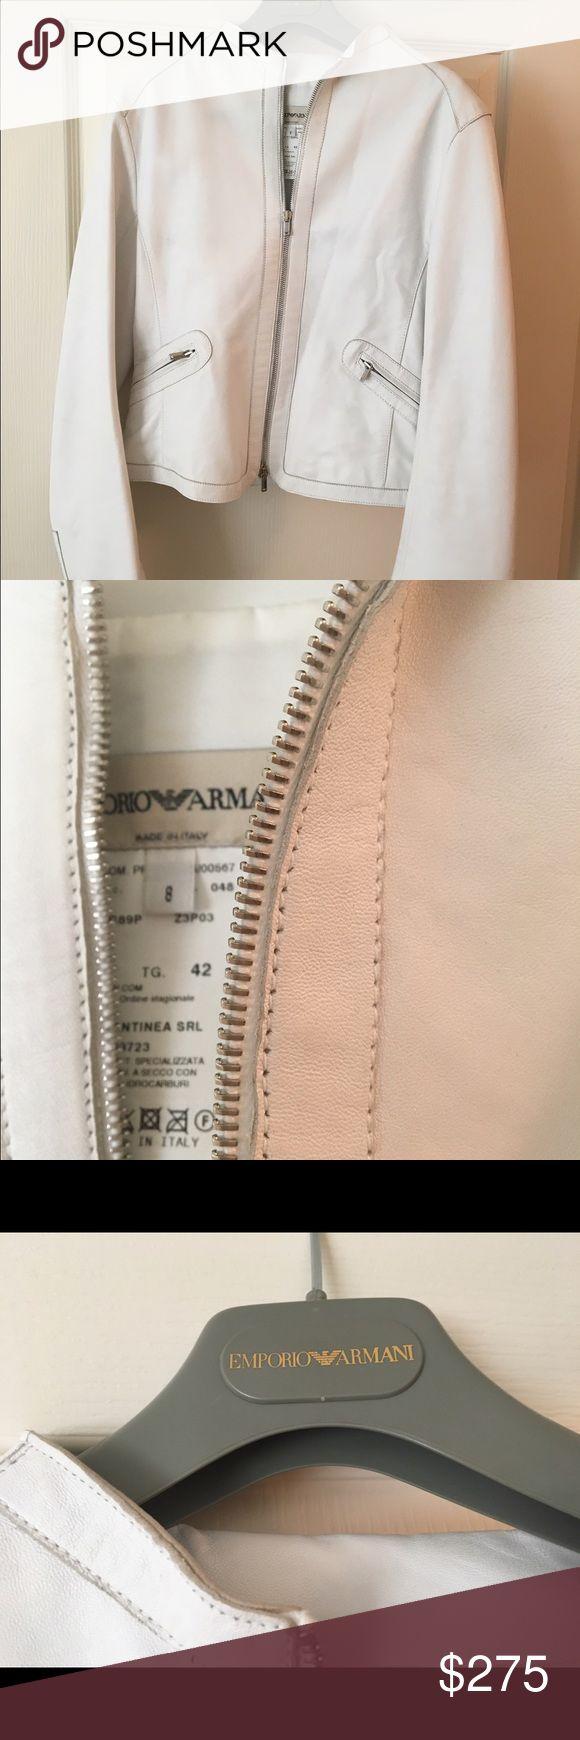 Giorgio Armani Leather Jacket Giorgio Armani White Leather rocker style jacket. Excellent condition. Size 8. Stored in protective coat bag. Giorgio Armani Jackets & Coats